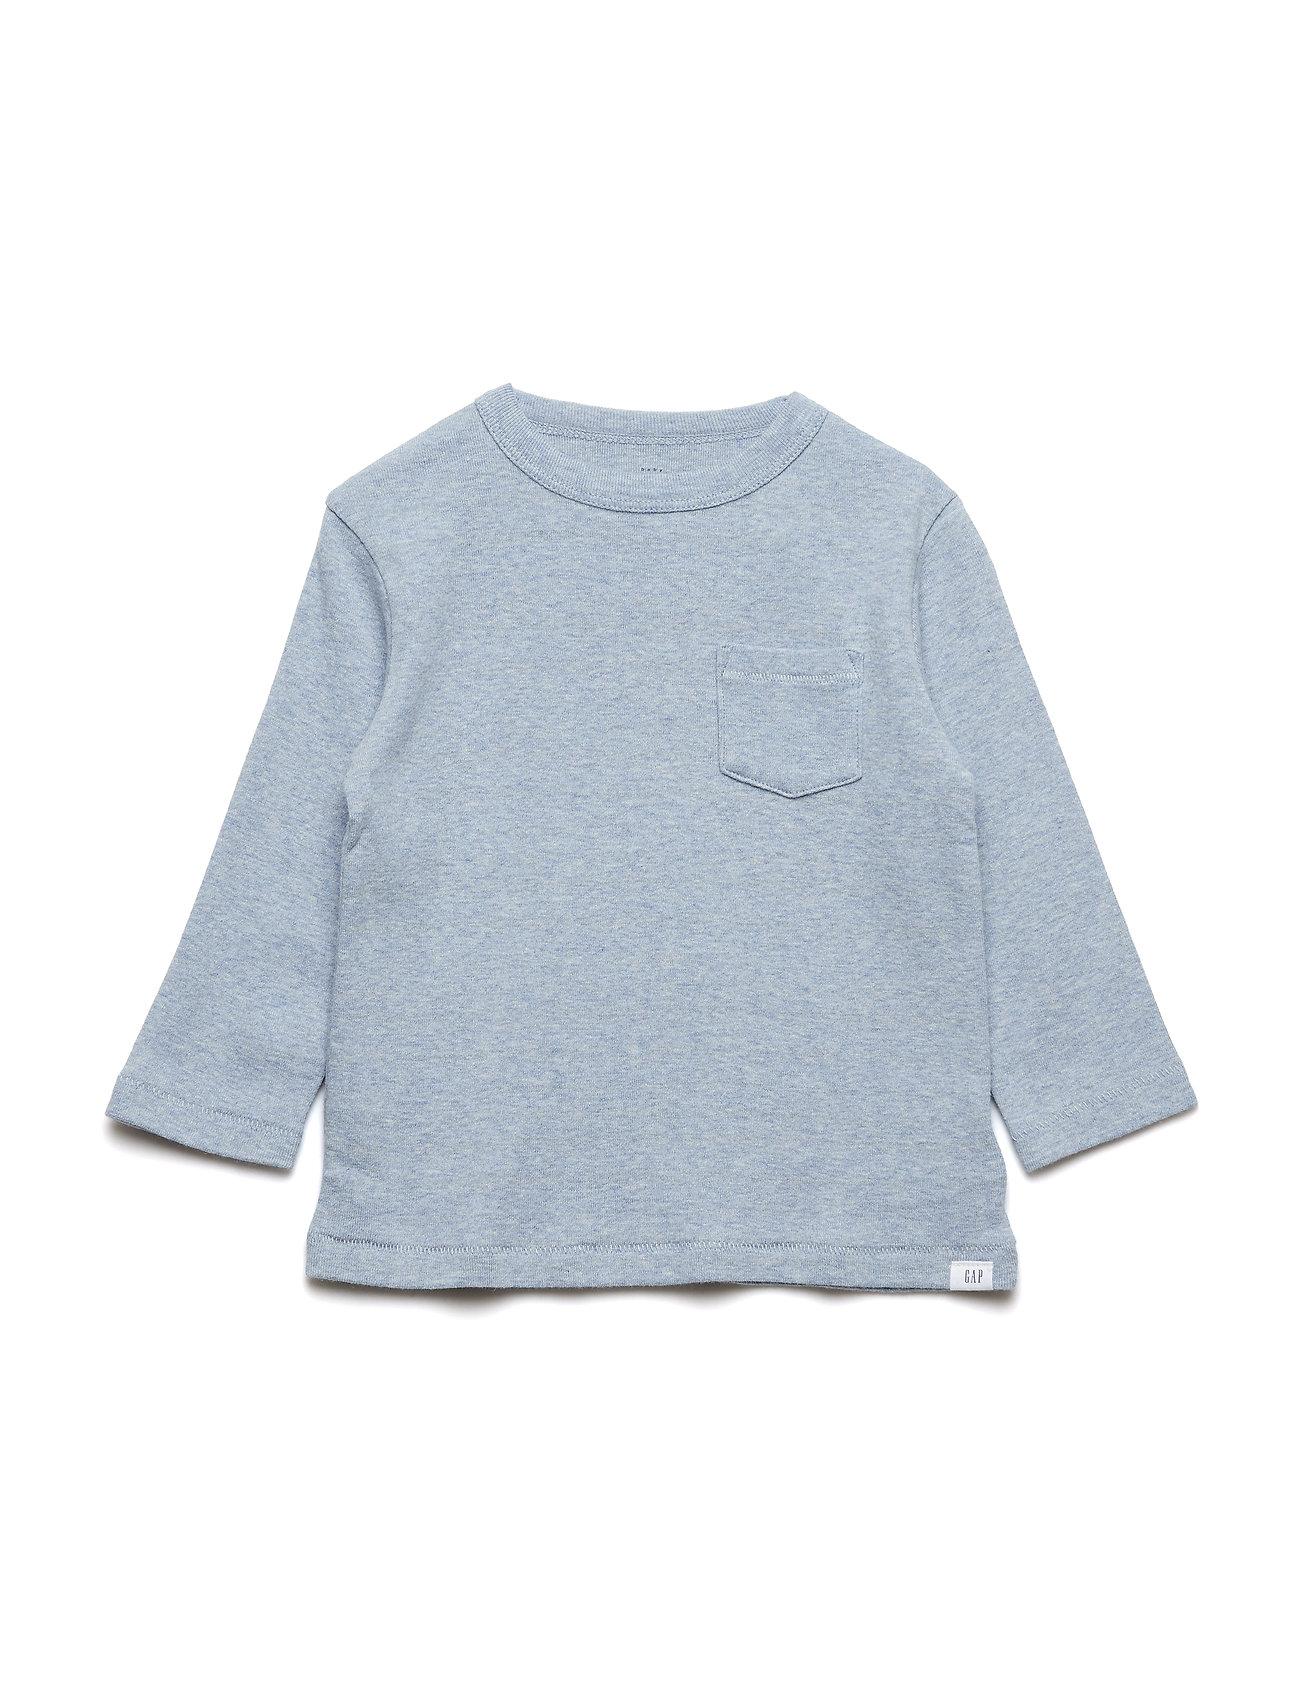 GAP Toddler Long Sleeve T-Shirt - BLUE HEATHER